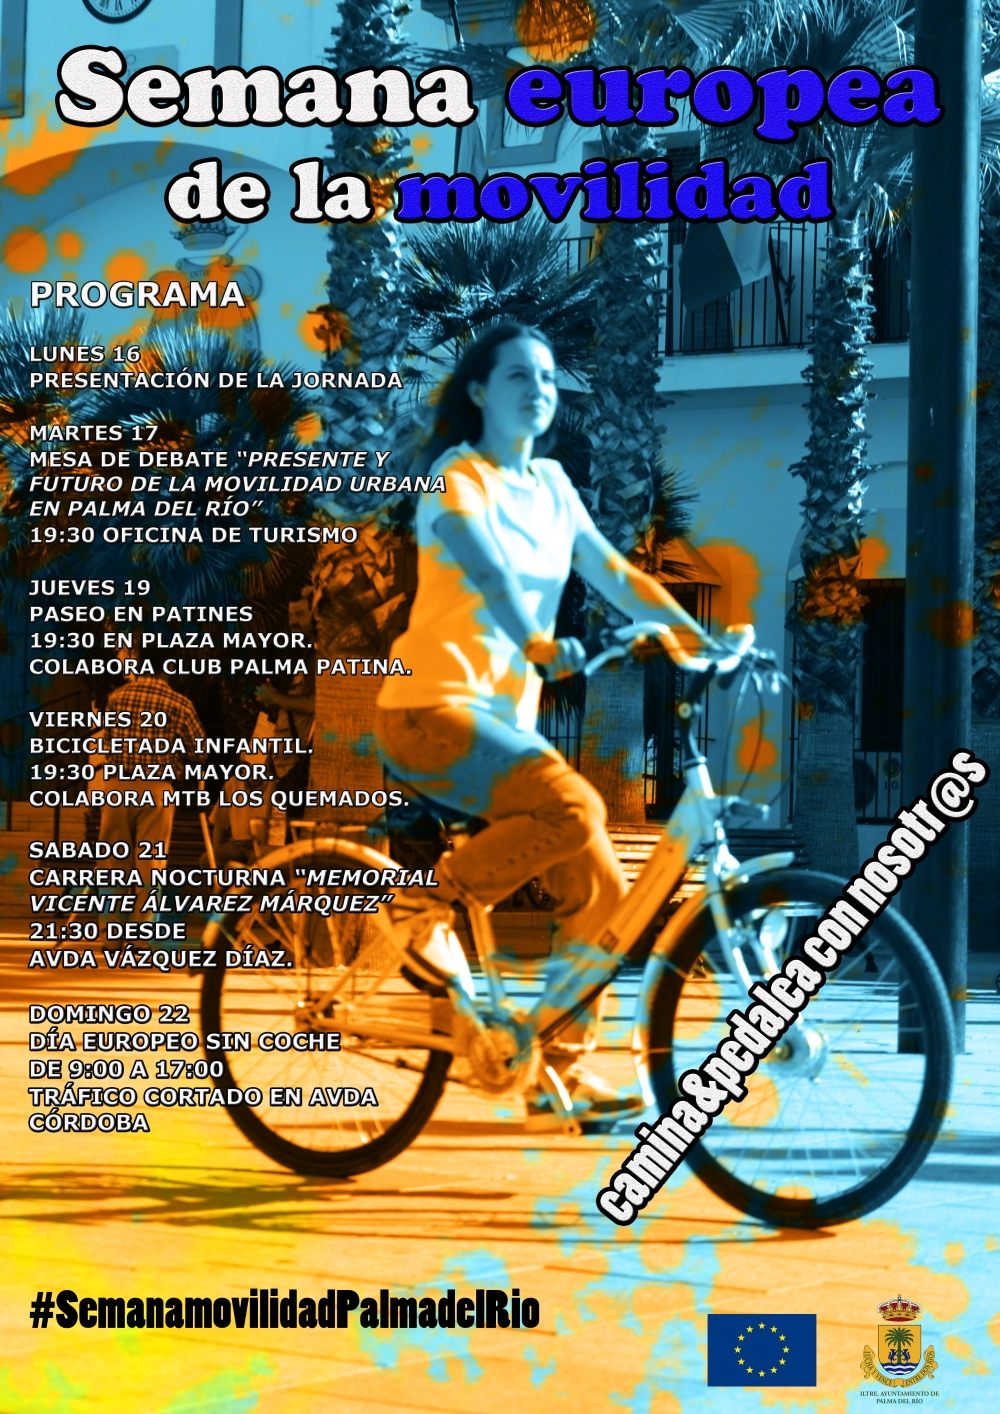 https://www.palmadelrio.es/sites/default/files/semana_movilidad_a3.jpg